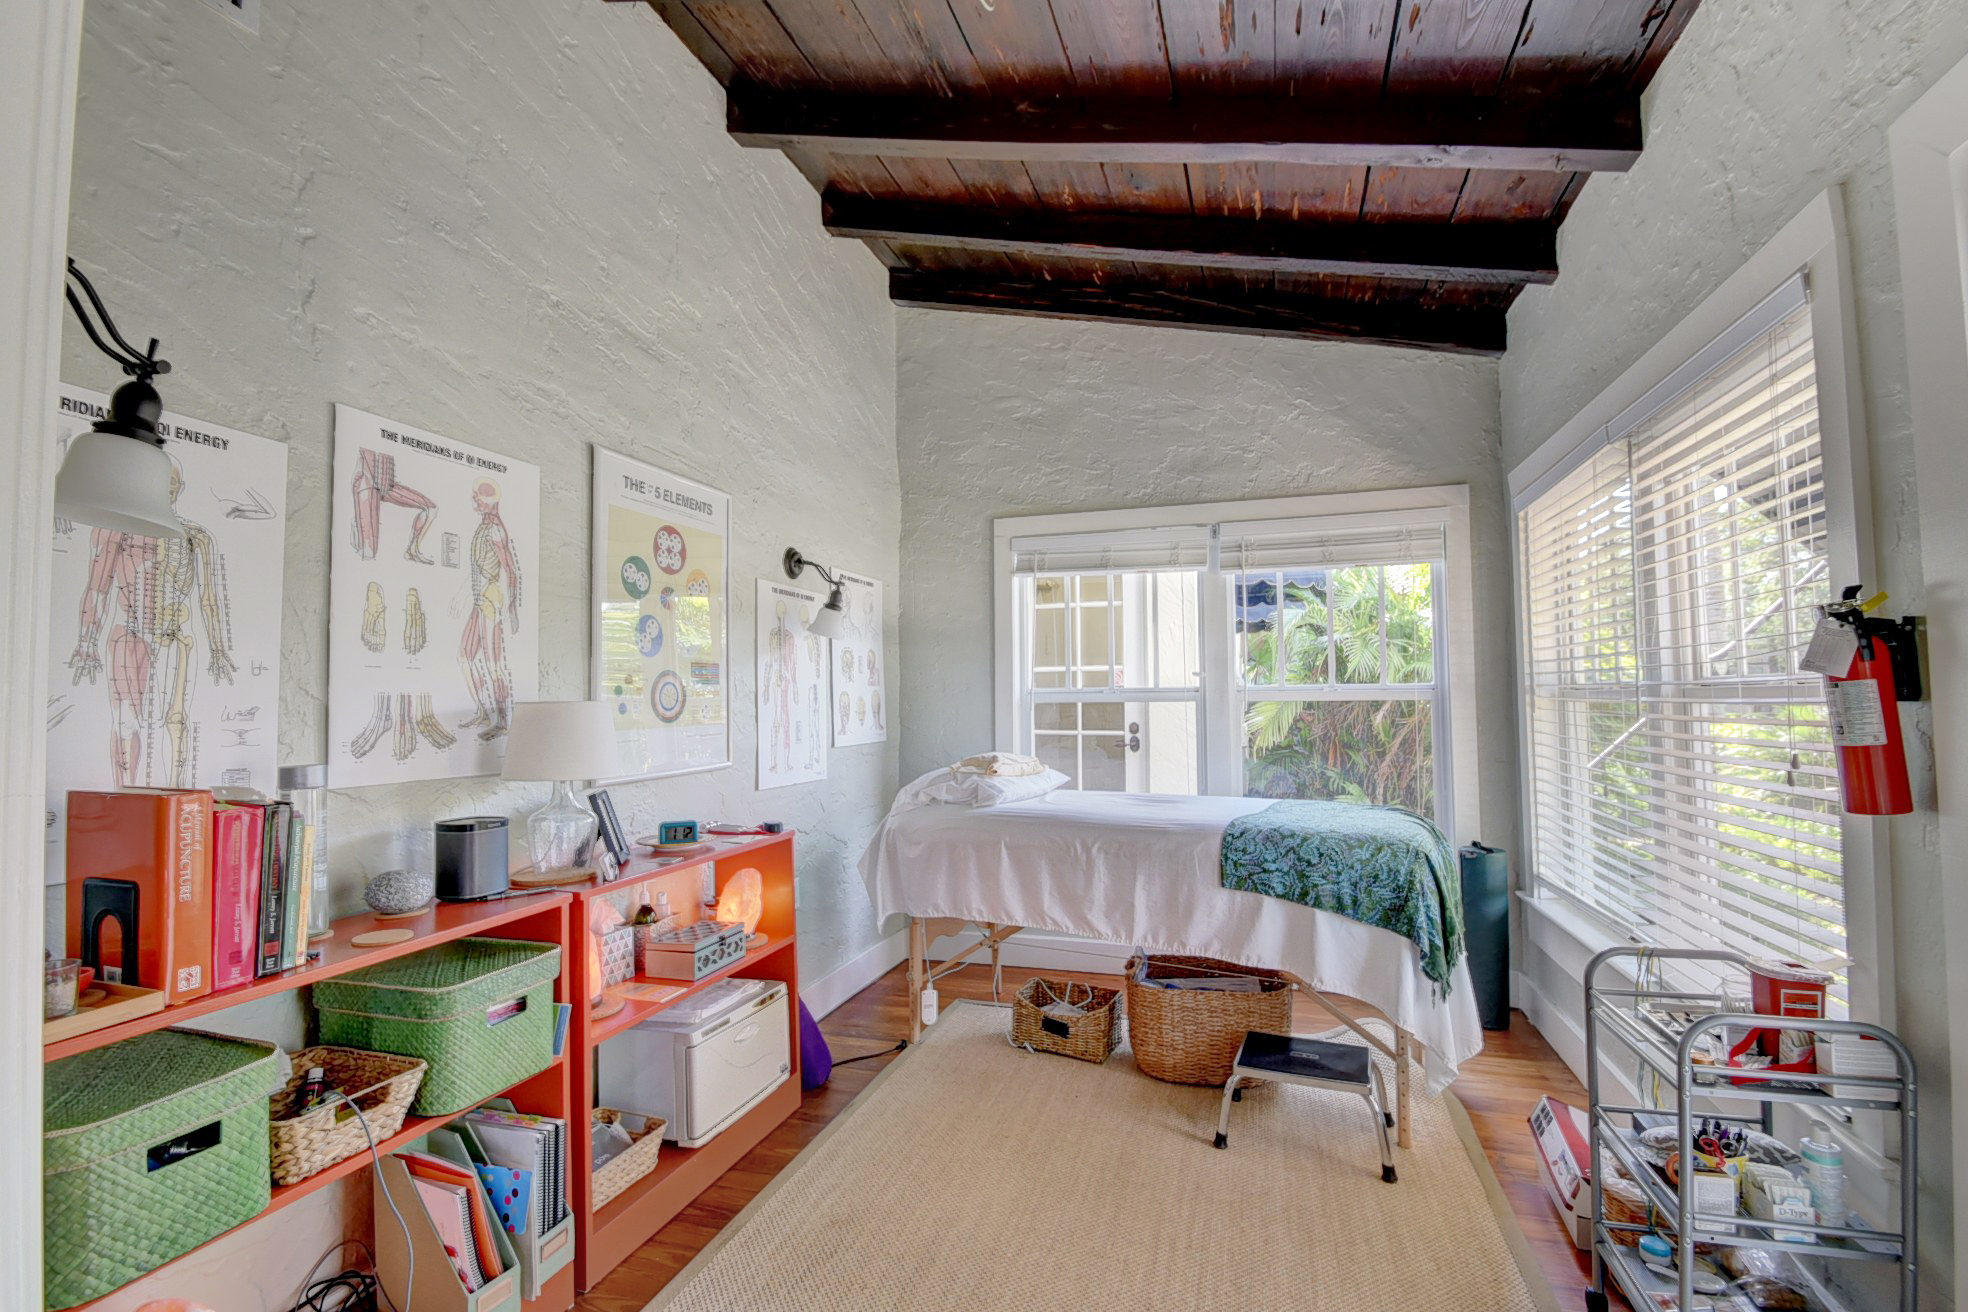 205 NE 5th Terrace gallery image #39